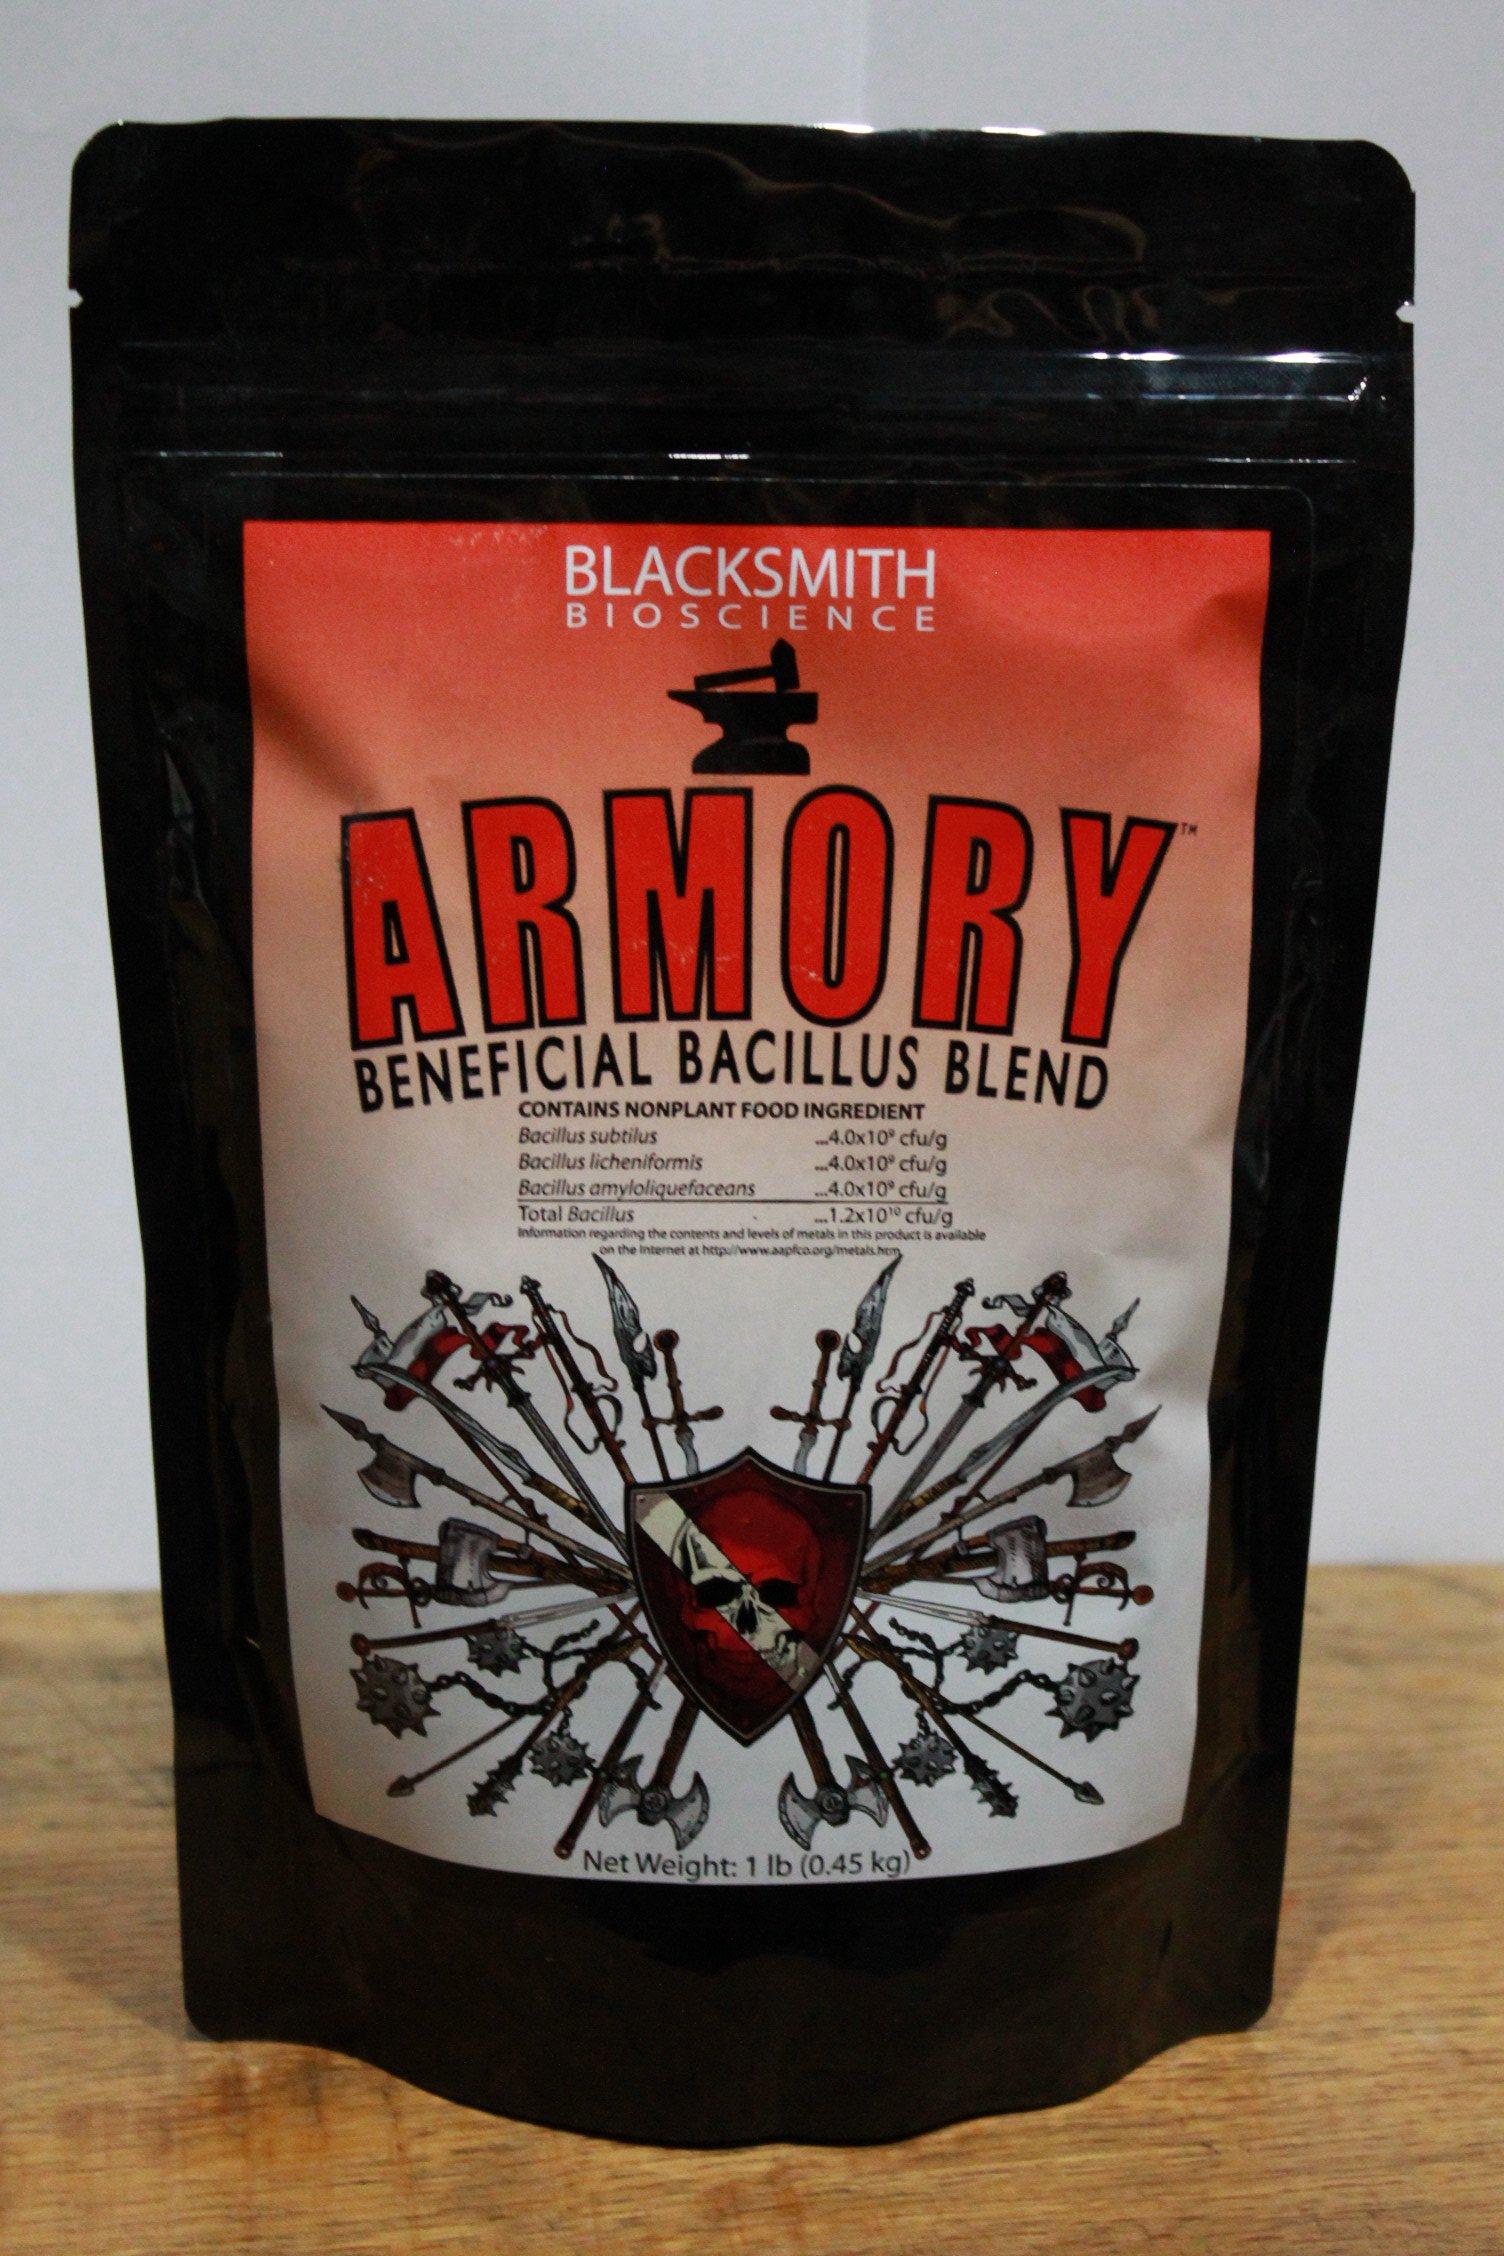 Blacksmith Bioscience Armory Beneficial Bacillus Blend 1 lb bag